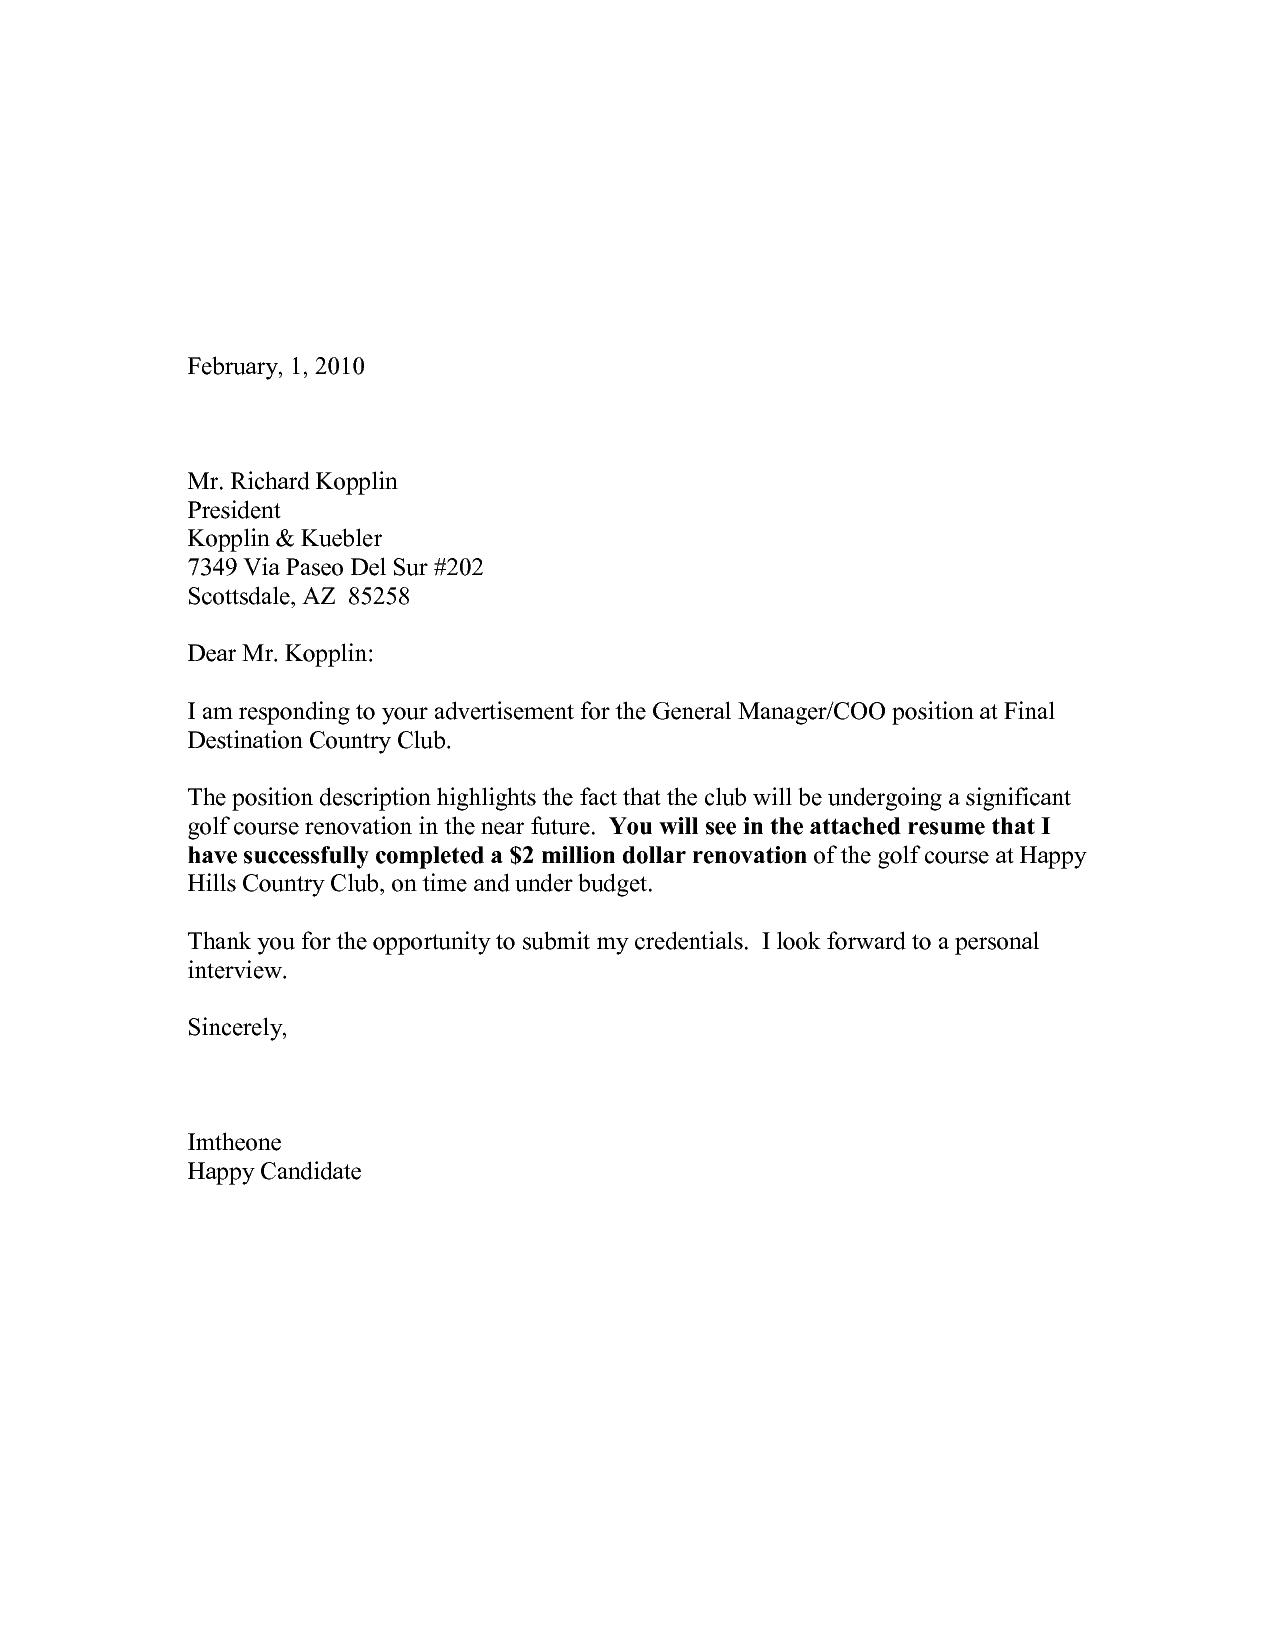 cover letter template for university application booker ...